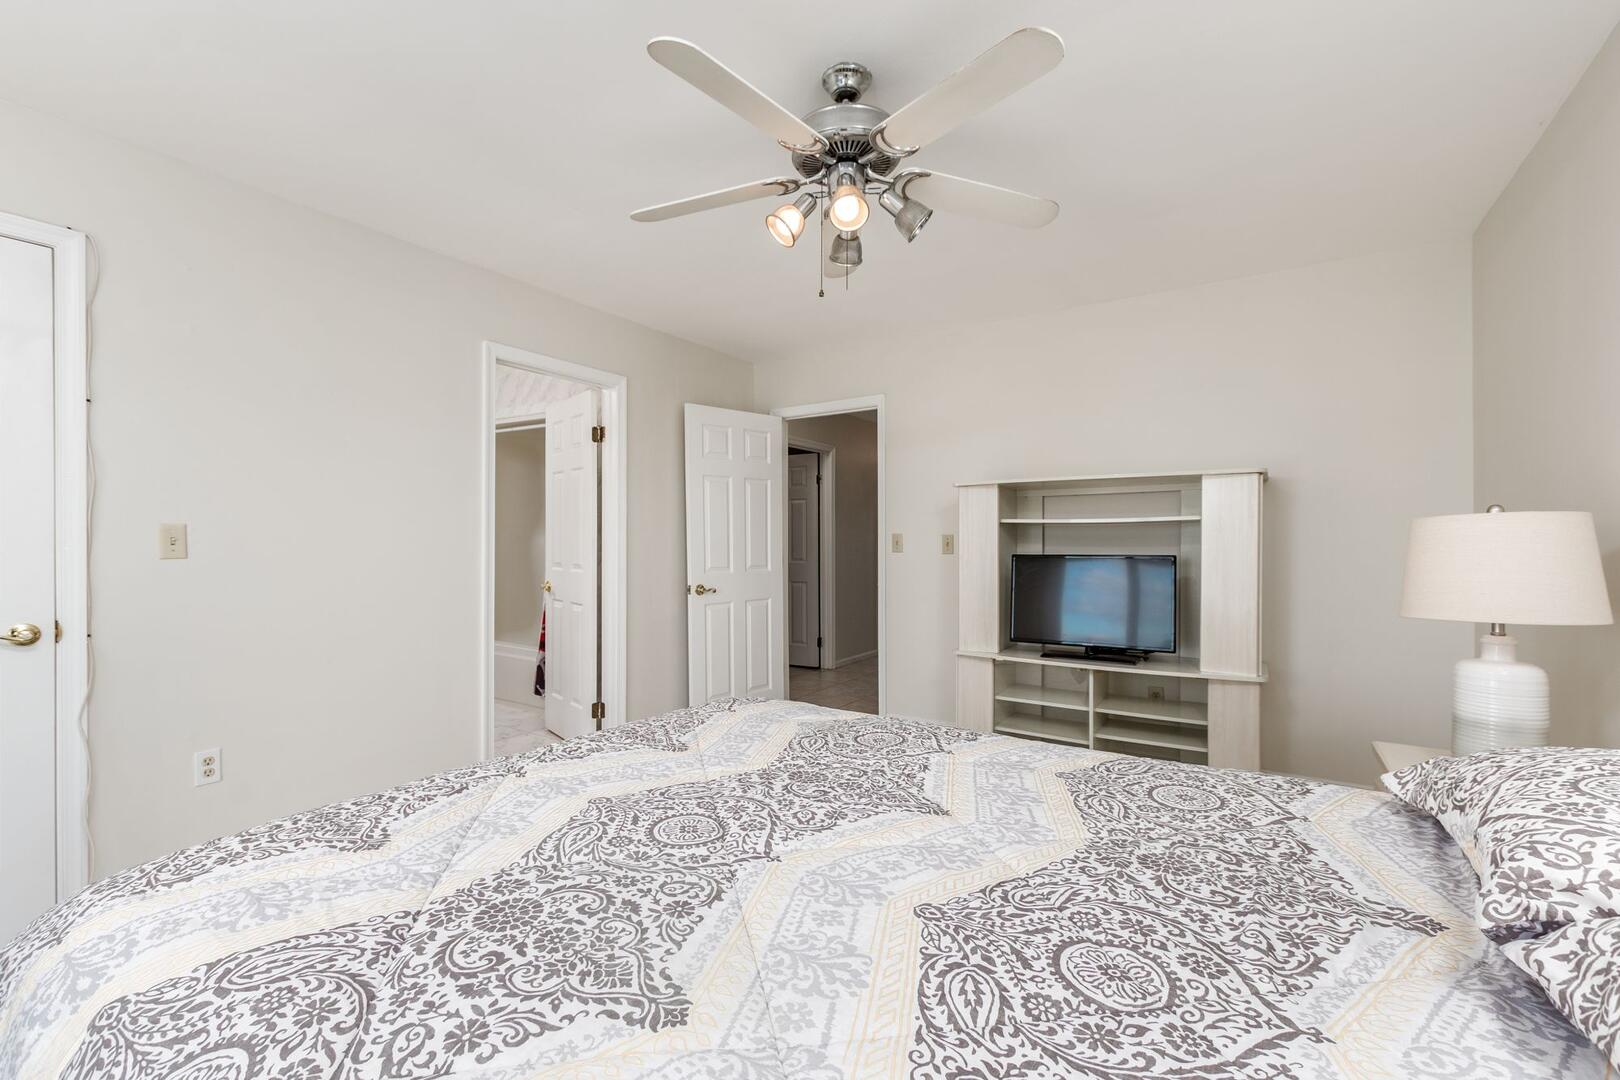 Master Bedroom of Sunset Harbour 14127B